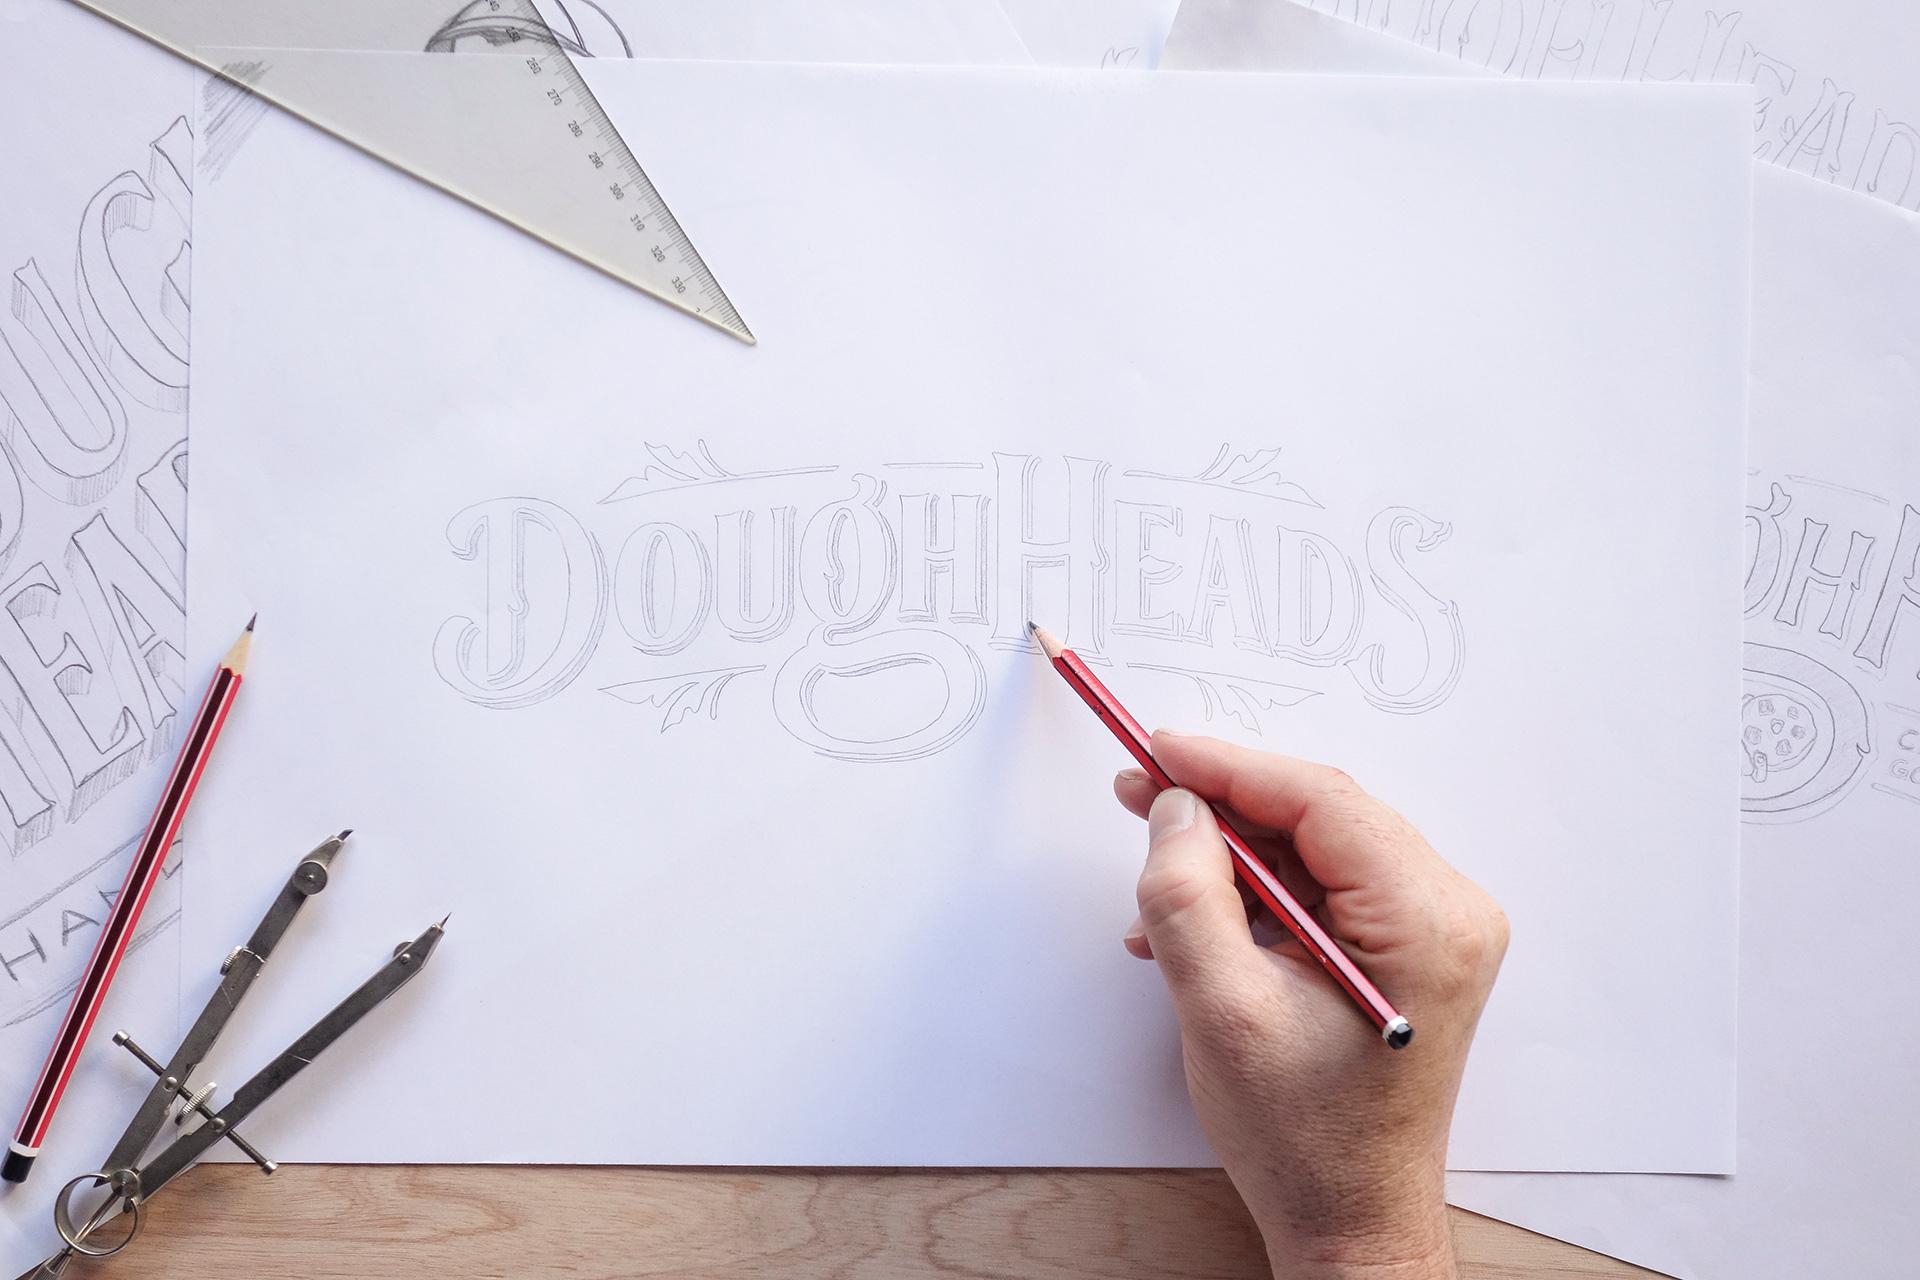 Pocket Design. Doughheads Branding Design